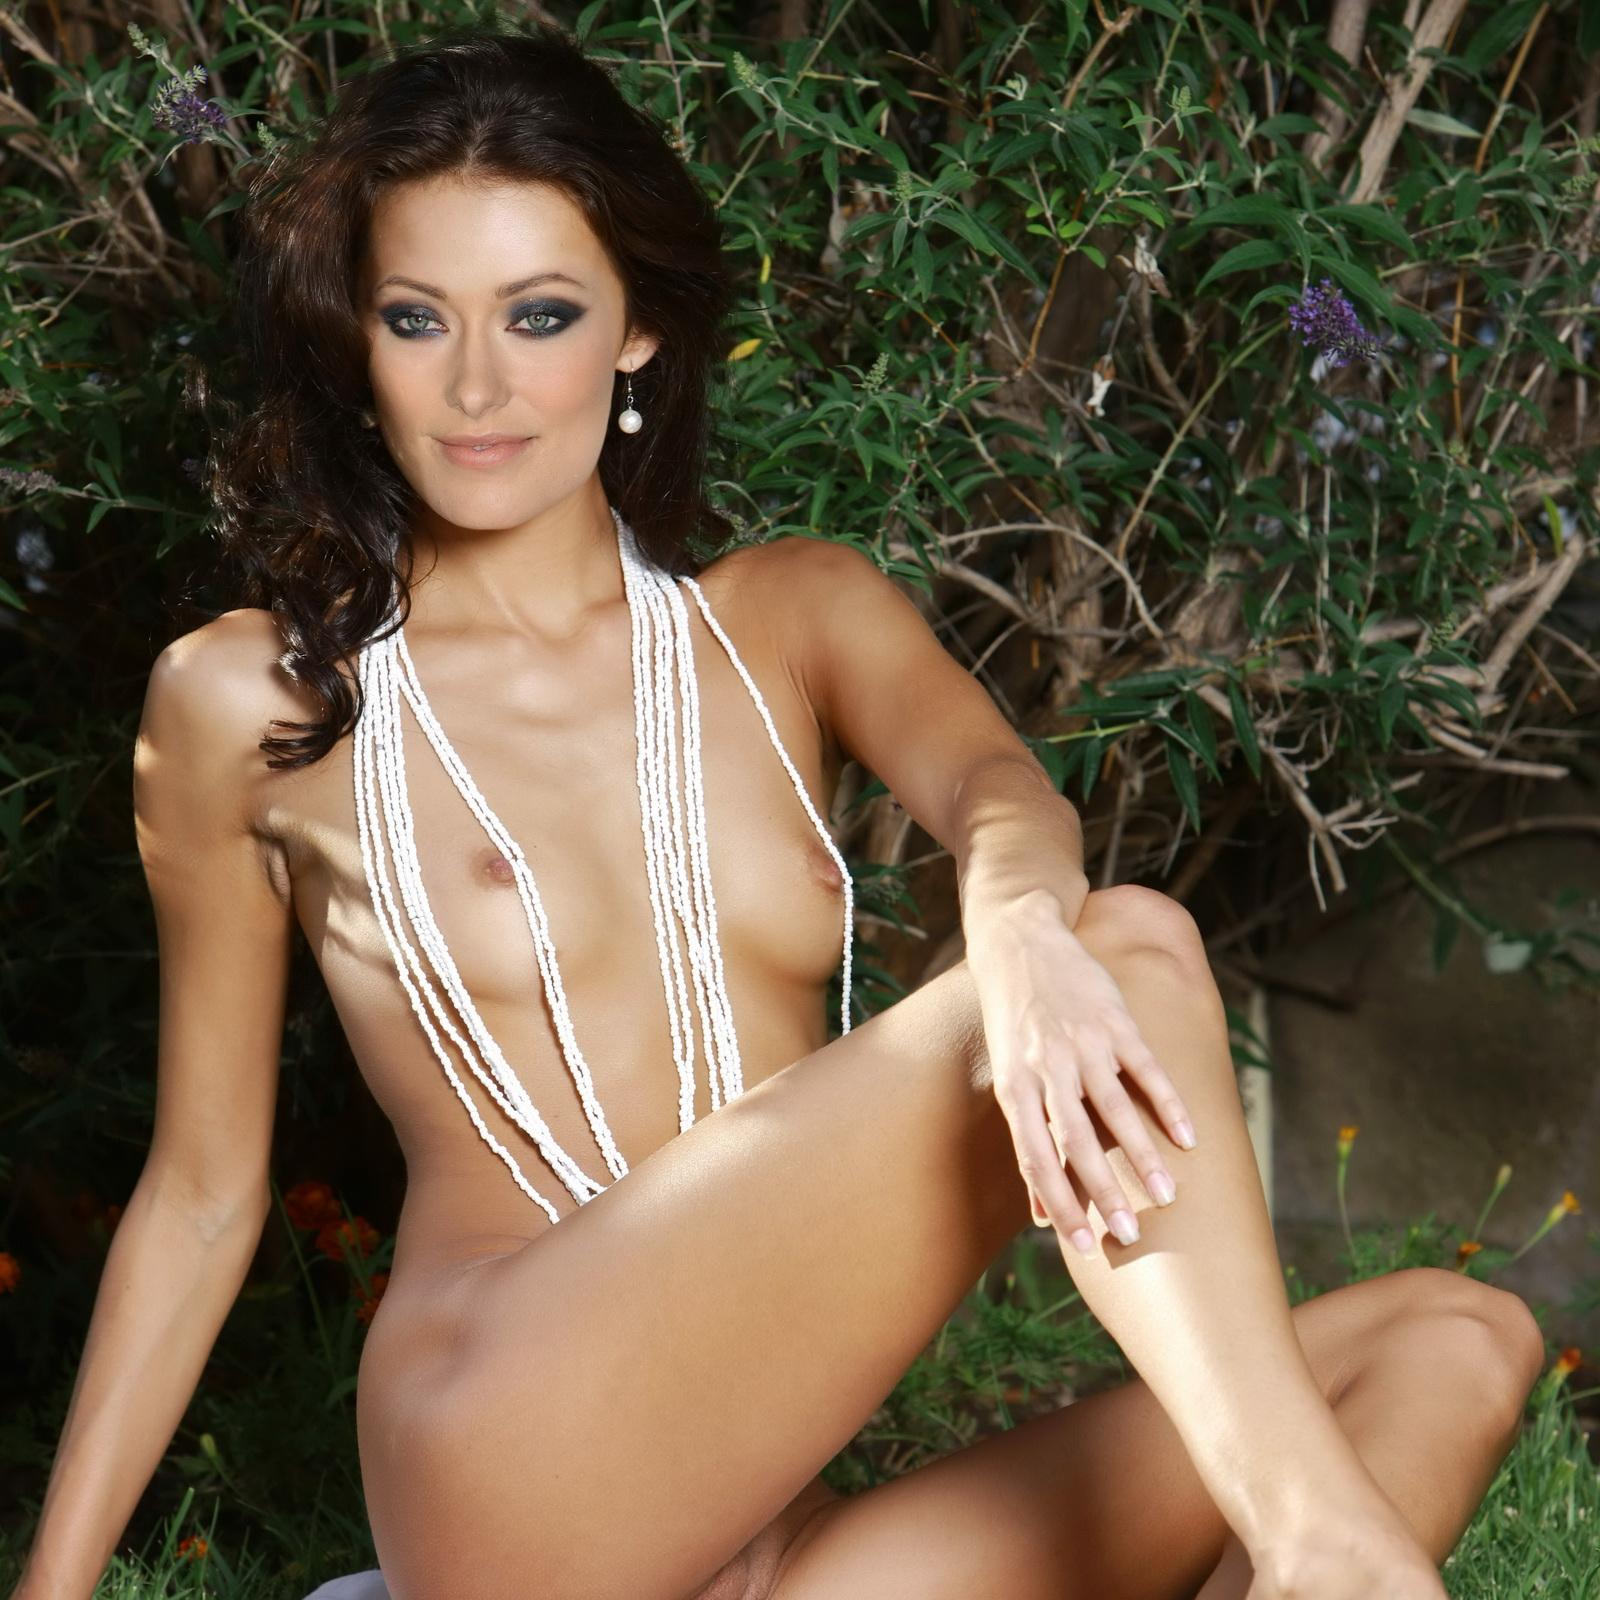 http://3.bp.blogspot.com/-sm084puwCVM/T361S-7khEI/AAAAAAAAANY/nZrRB1xZyhY/s1600/Olivia+Wilde+nude+in+hen-party+photo+shoot+2.jpg